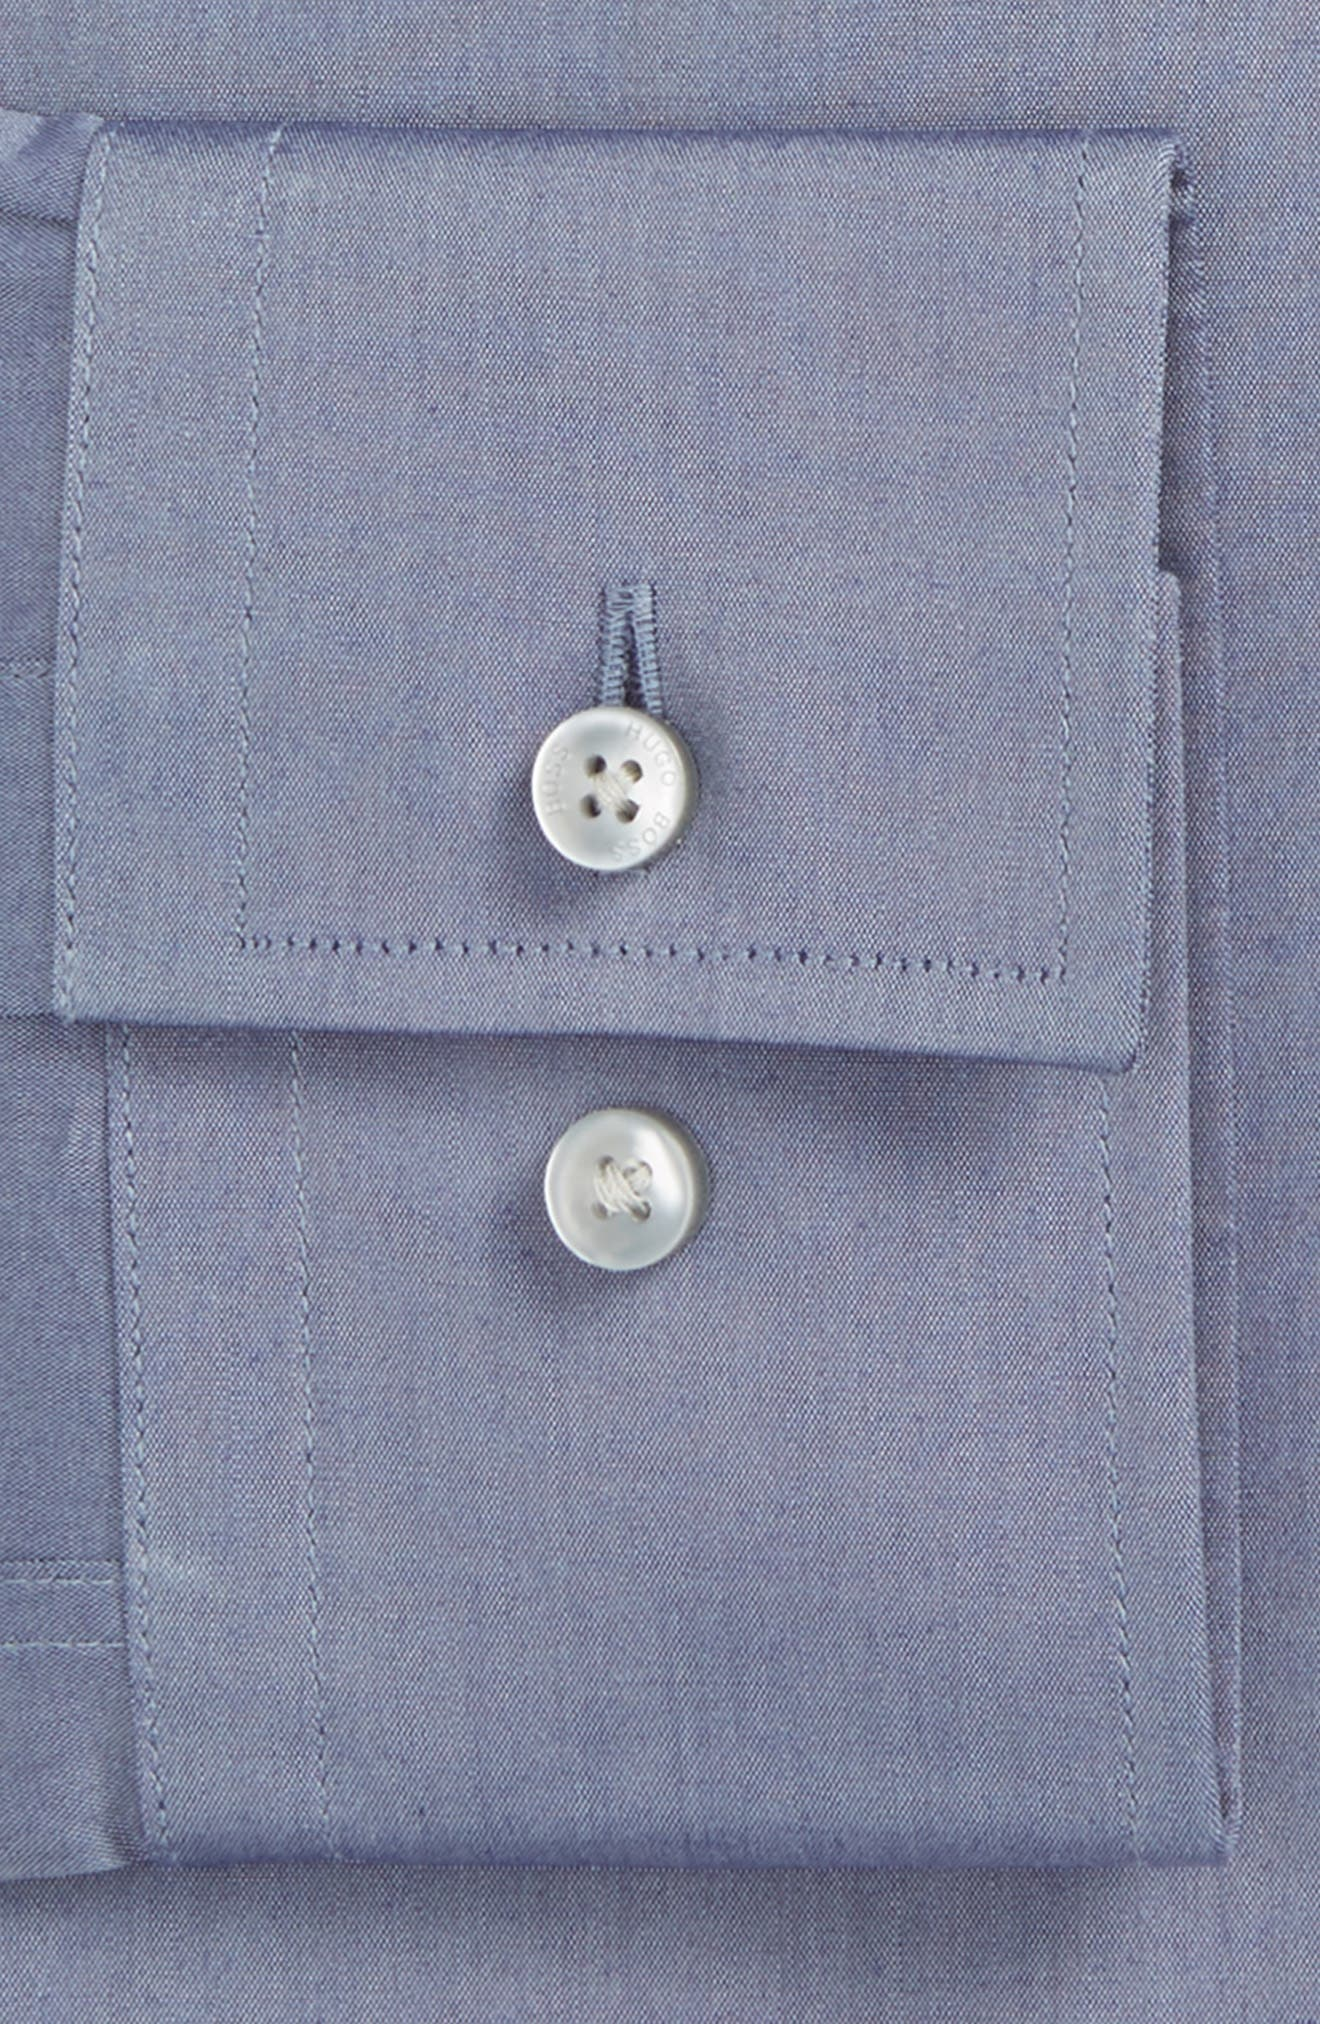 Jenno Slim Fit Solid Dress Shirt,                             Alternate thumbnail 2, color,                             021